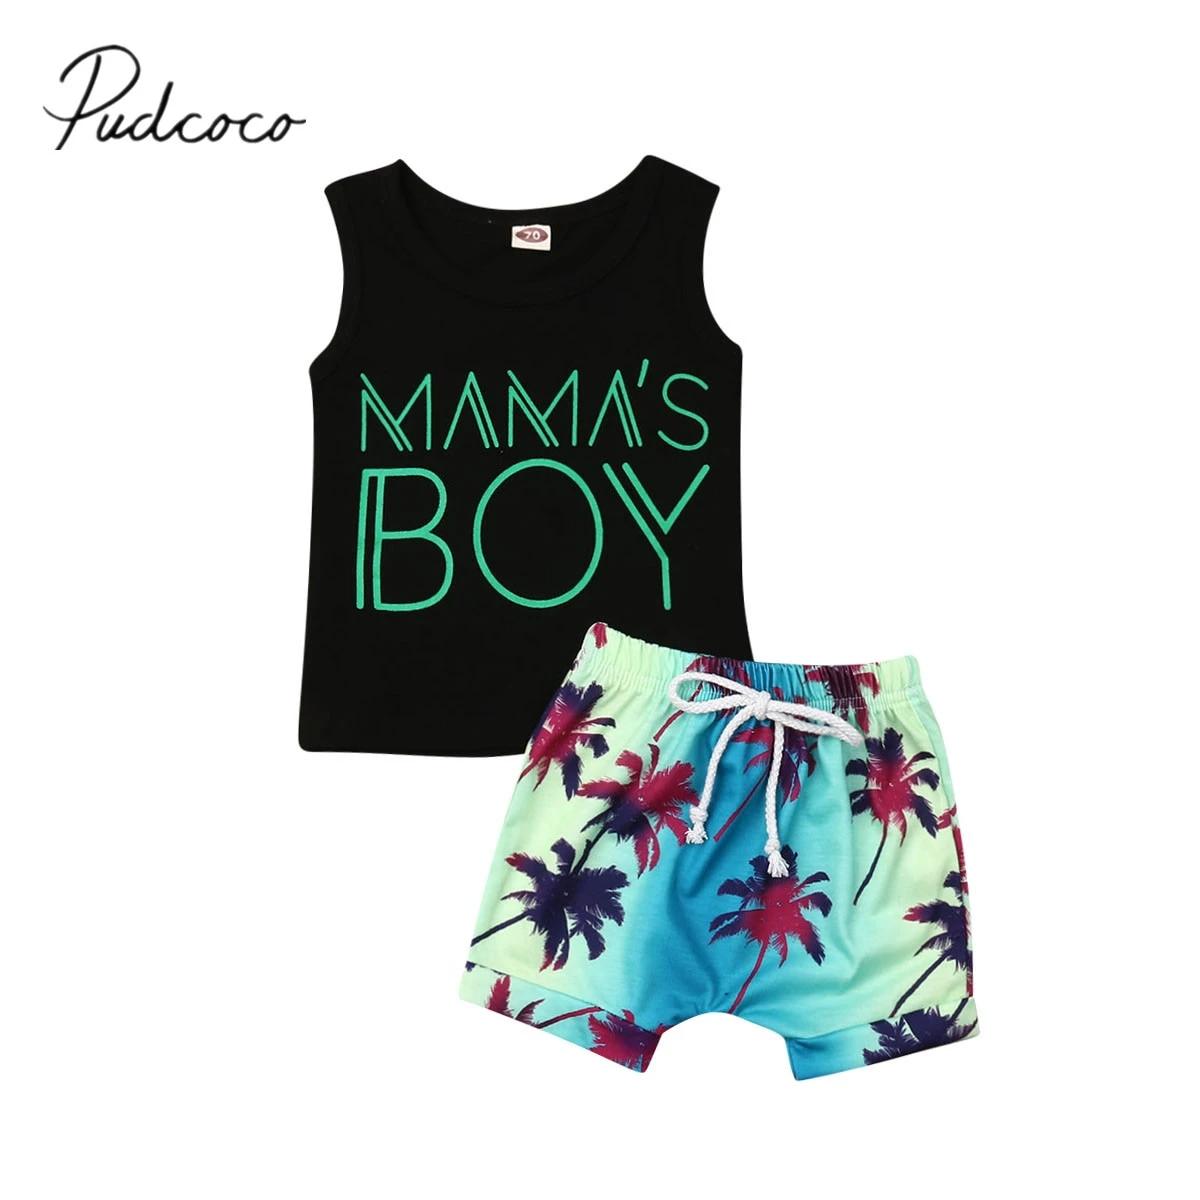 US Fashion Toddler Baby Boy Summer Clothes Vest T-shirt Shorts Outfits Sets 2PCS